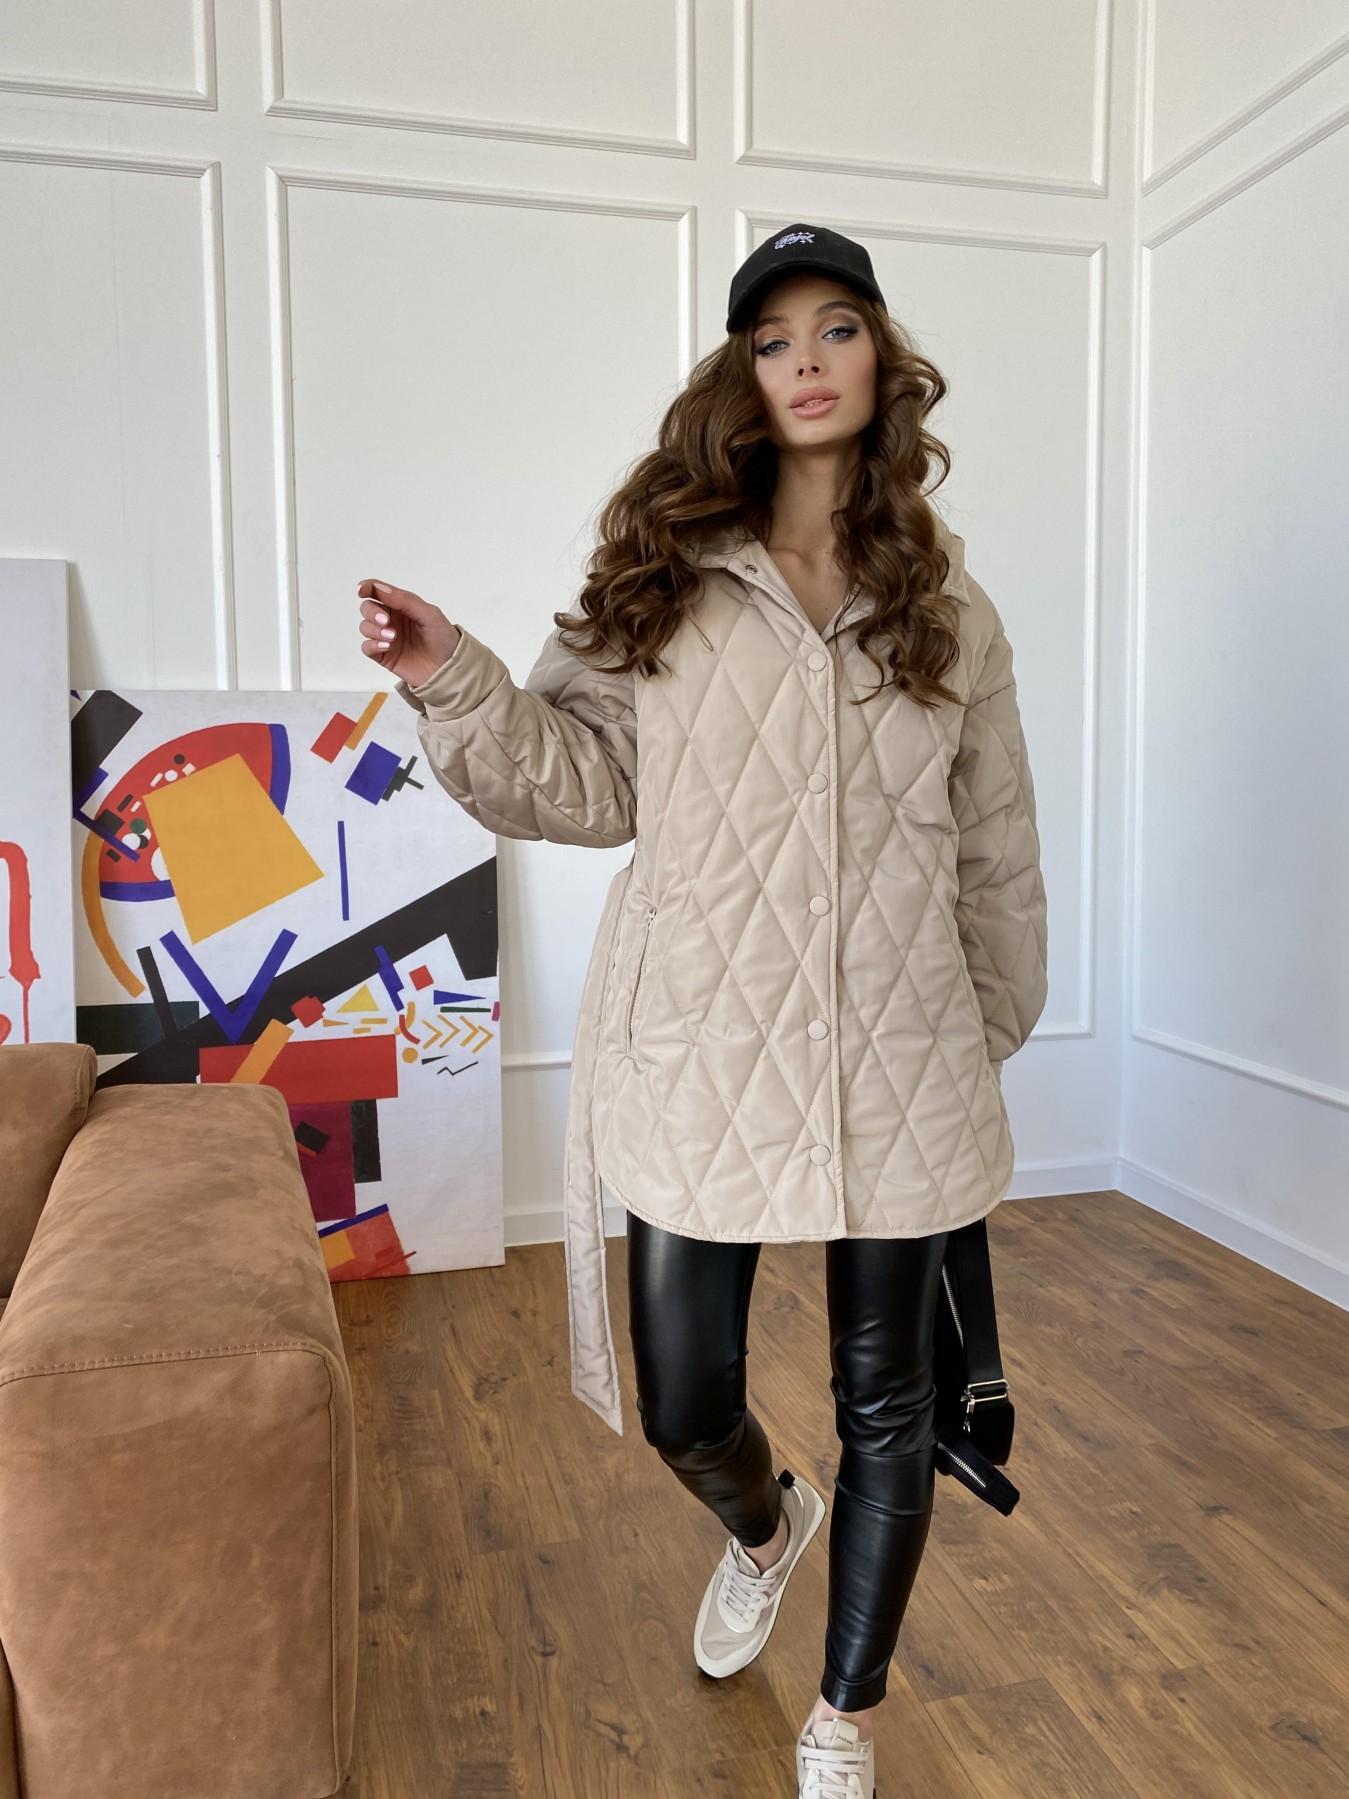 Пазл стеганая куртка из плащевки 10890 АРТ. 47449 Цвет: Бежевый - фото 4, интернет магазин tm-modus.ru